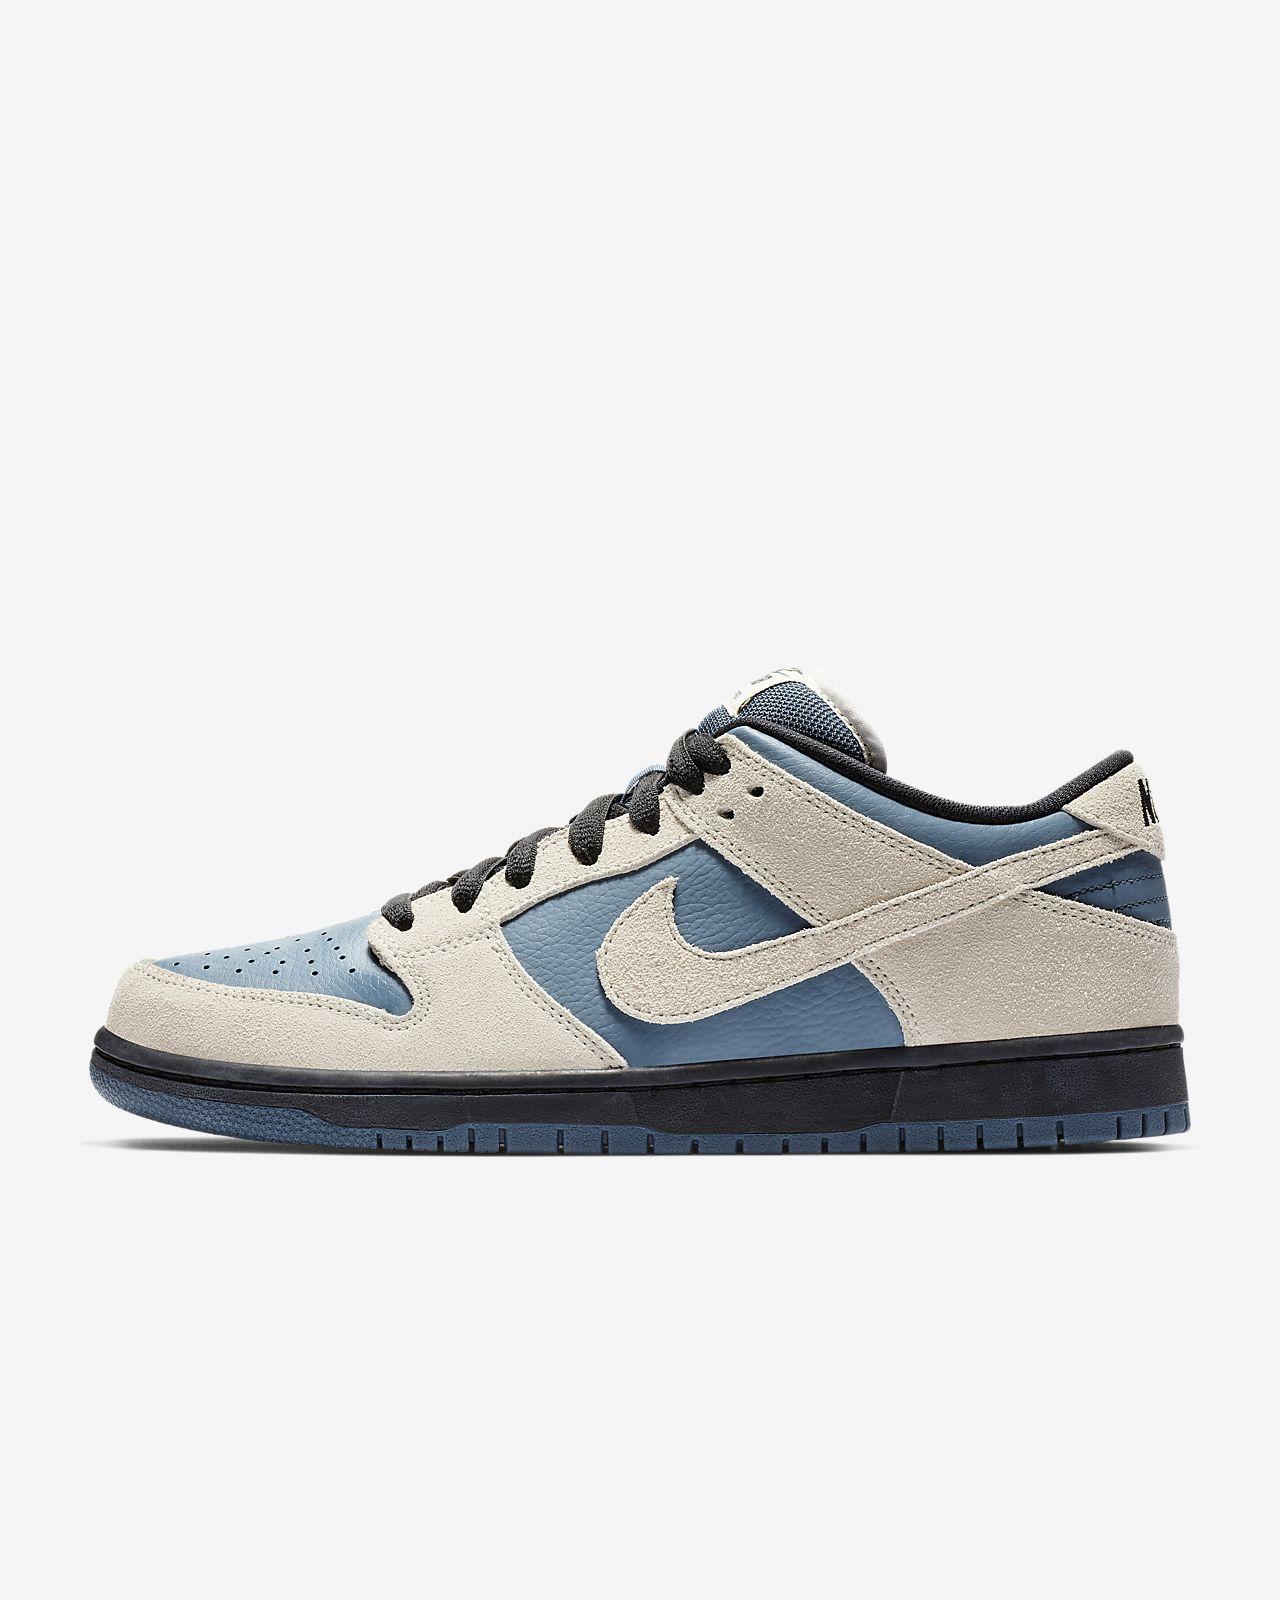 Nike SB Dunk Low Pro Kaykay Ayakkabısı